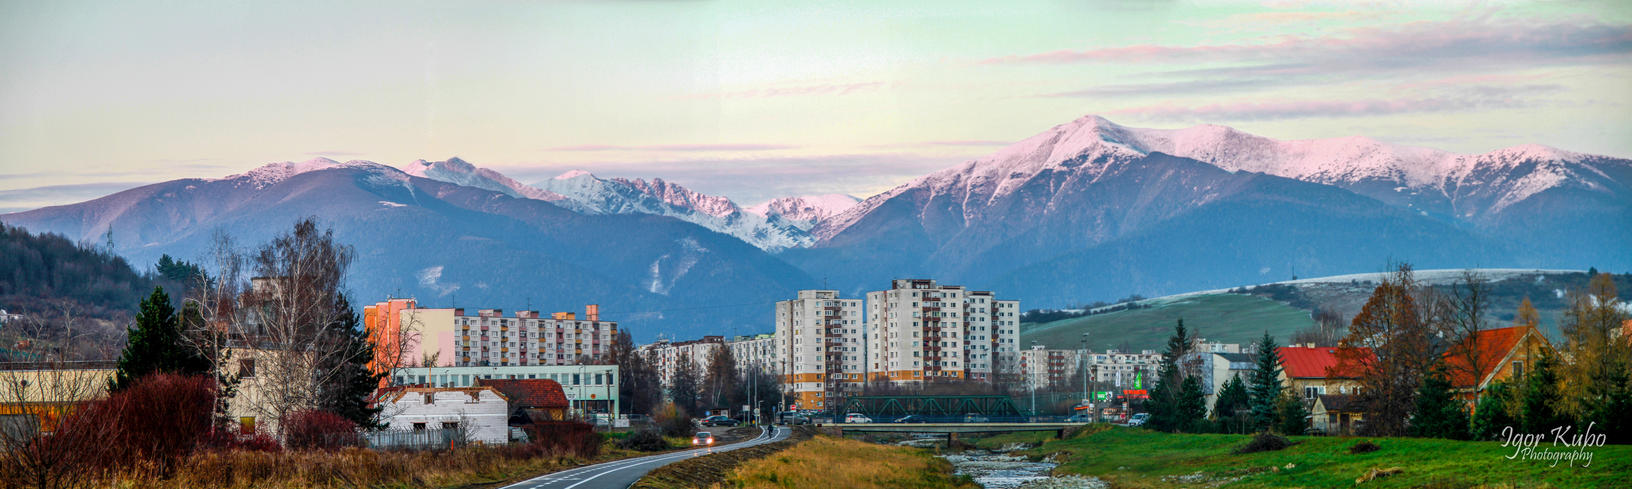 Podbreziny Panorama by igiman